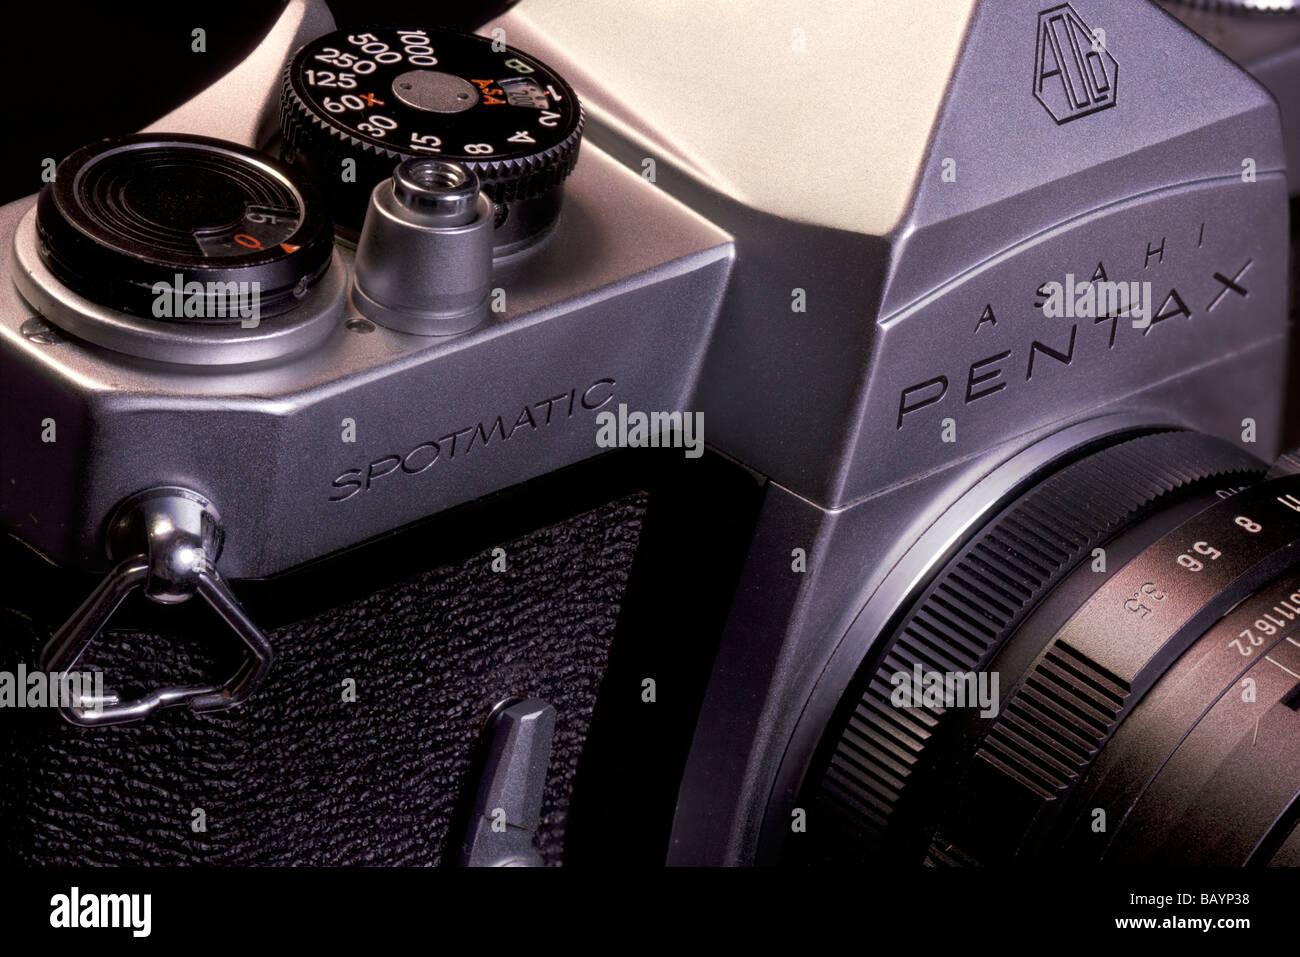 Asahi Pentax Spotmatic II, Classic 70's camera - Stock Image